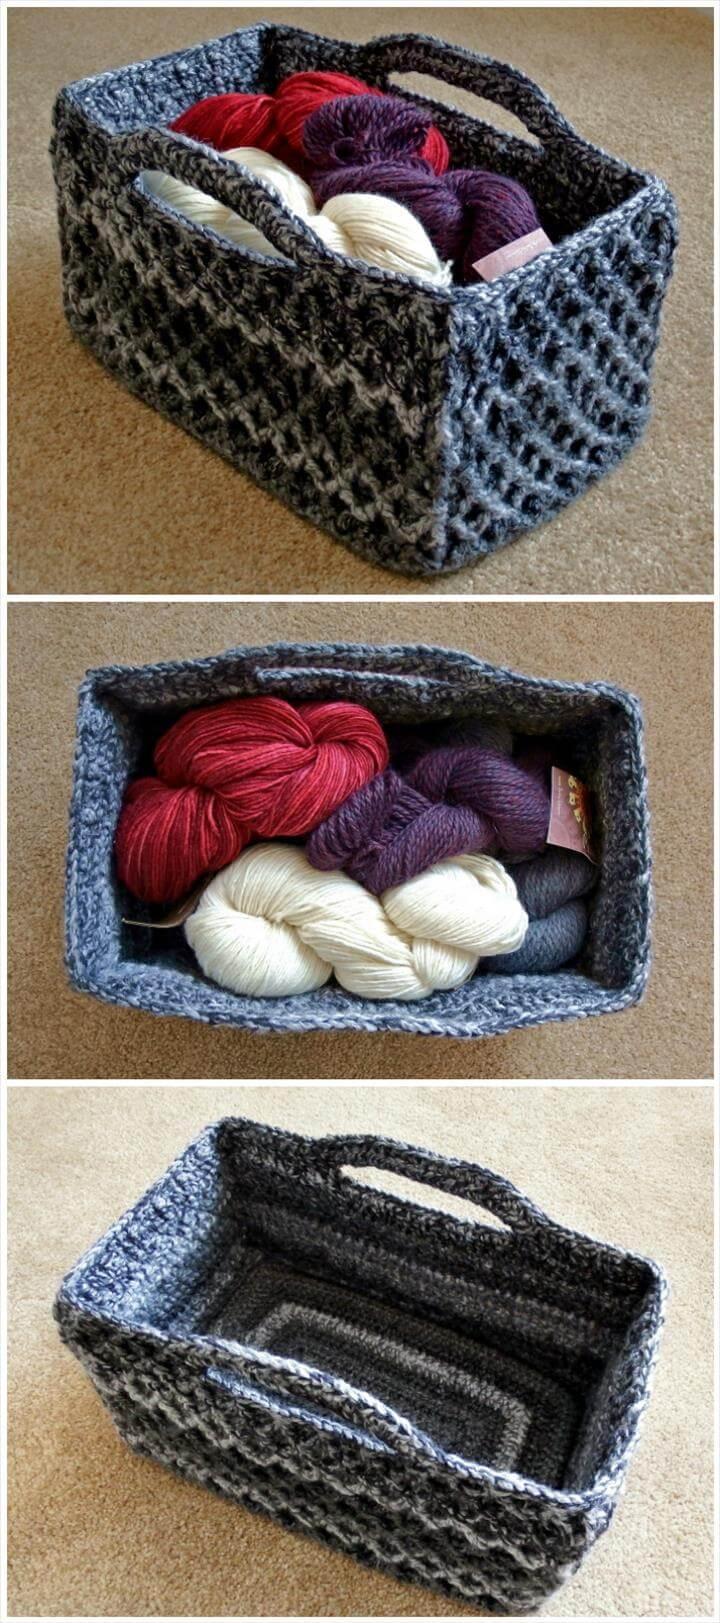 Crochet Rectangle Basket Pattern Free : 10 Free Crochet Basket Patterns for Beginners 101 Crochet